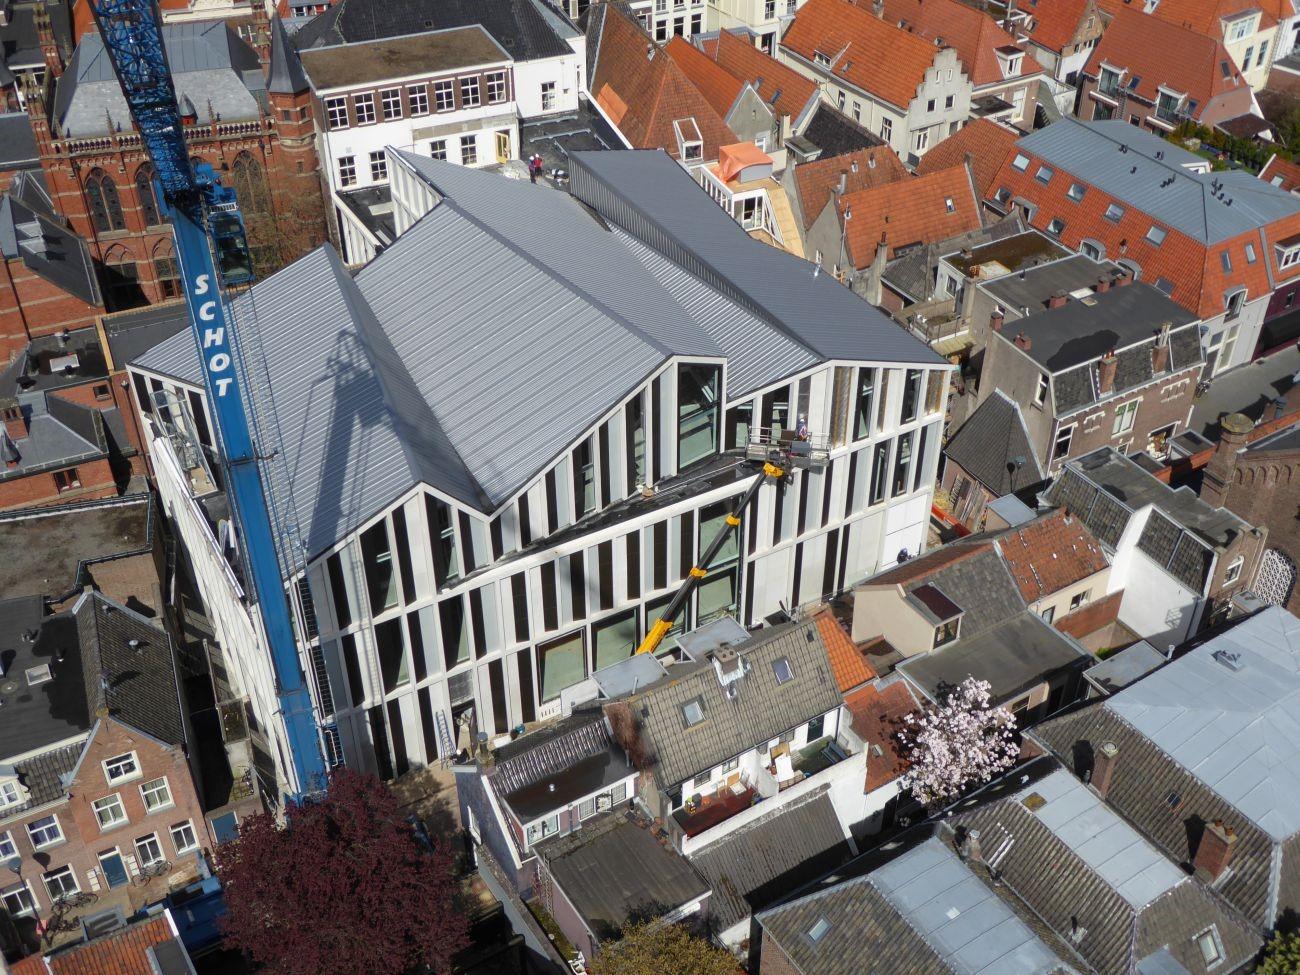 Bo Renoveert Winkelpanden In Zwolle De Architect